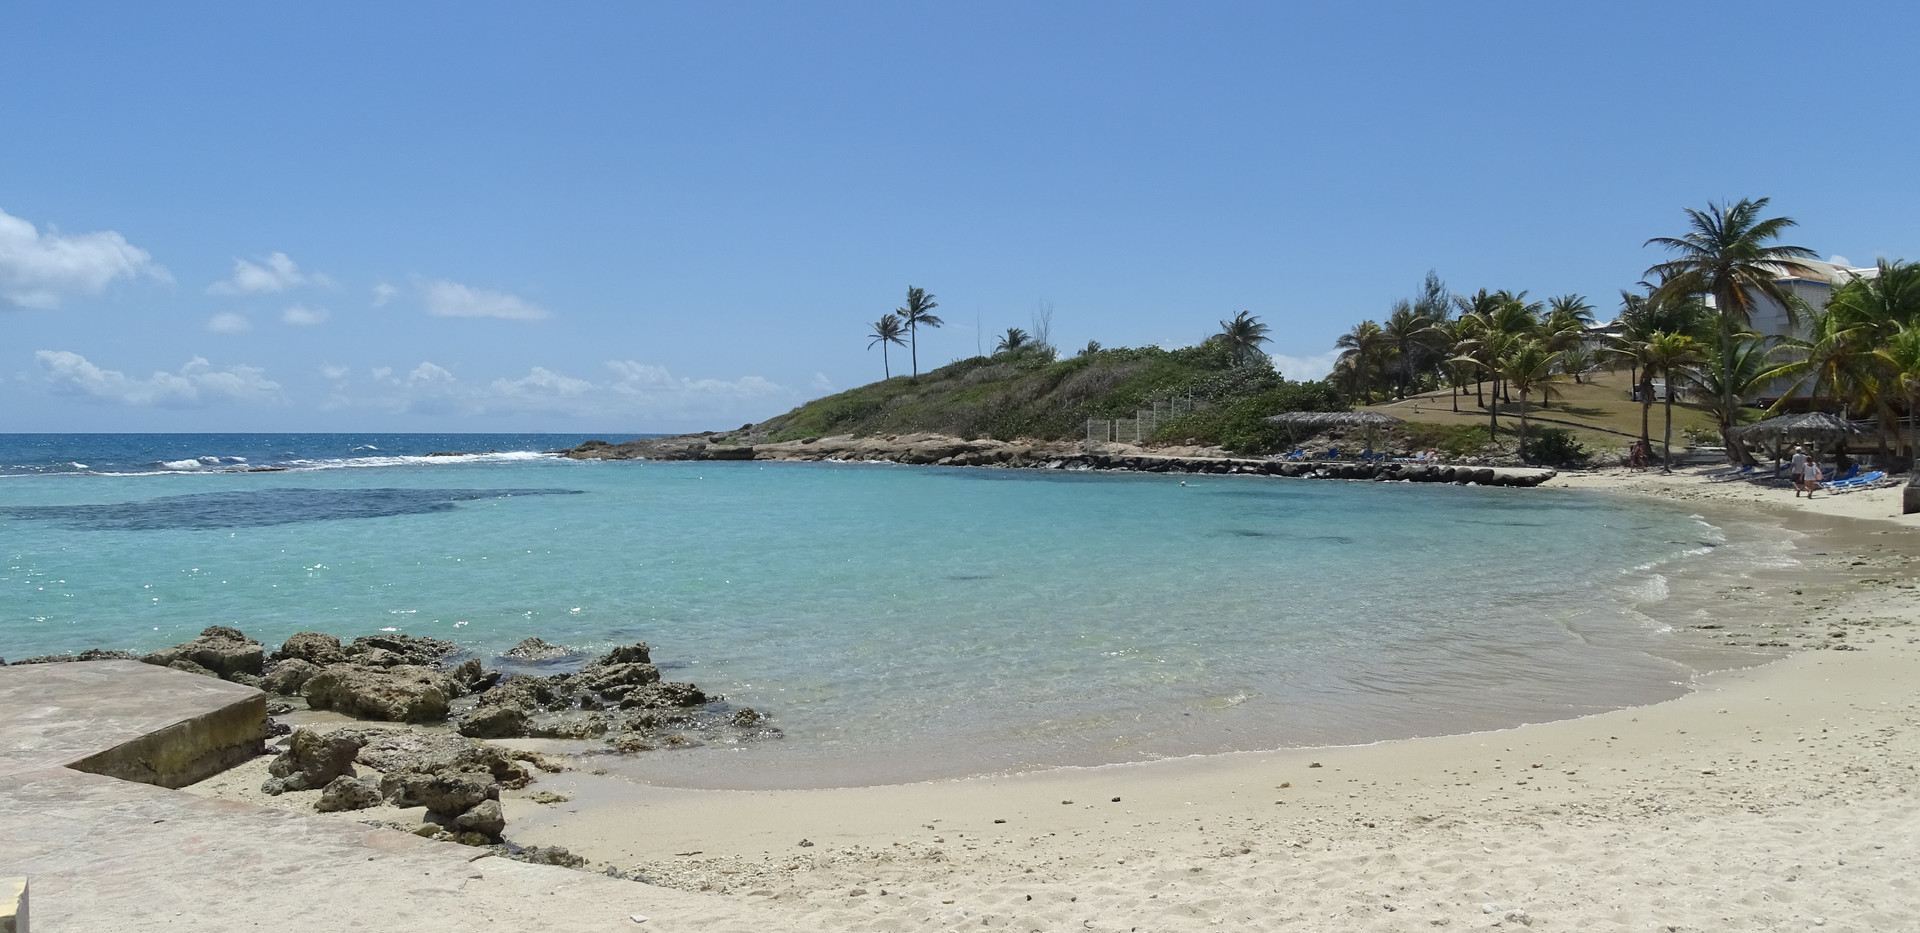 La plage du Manganao